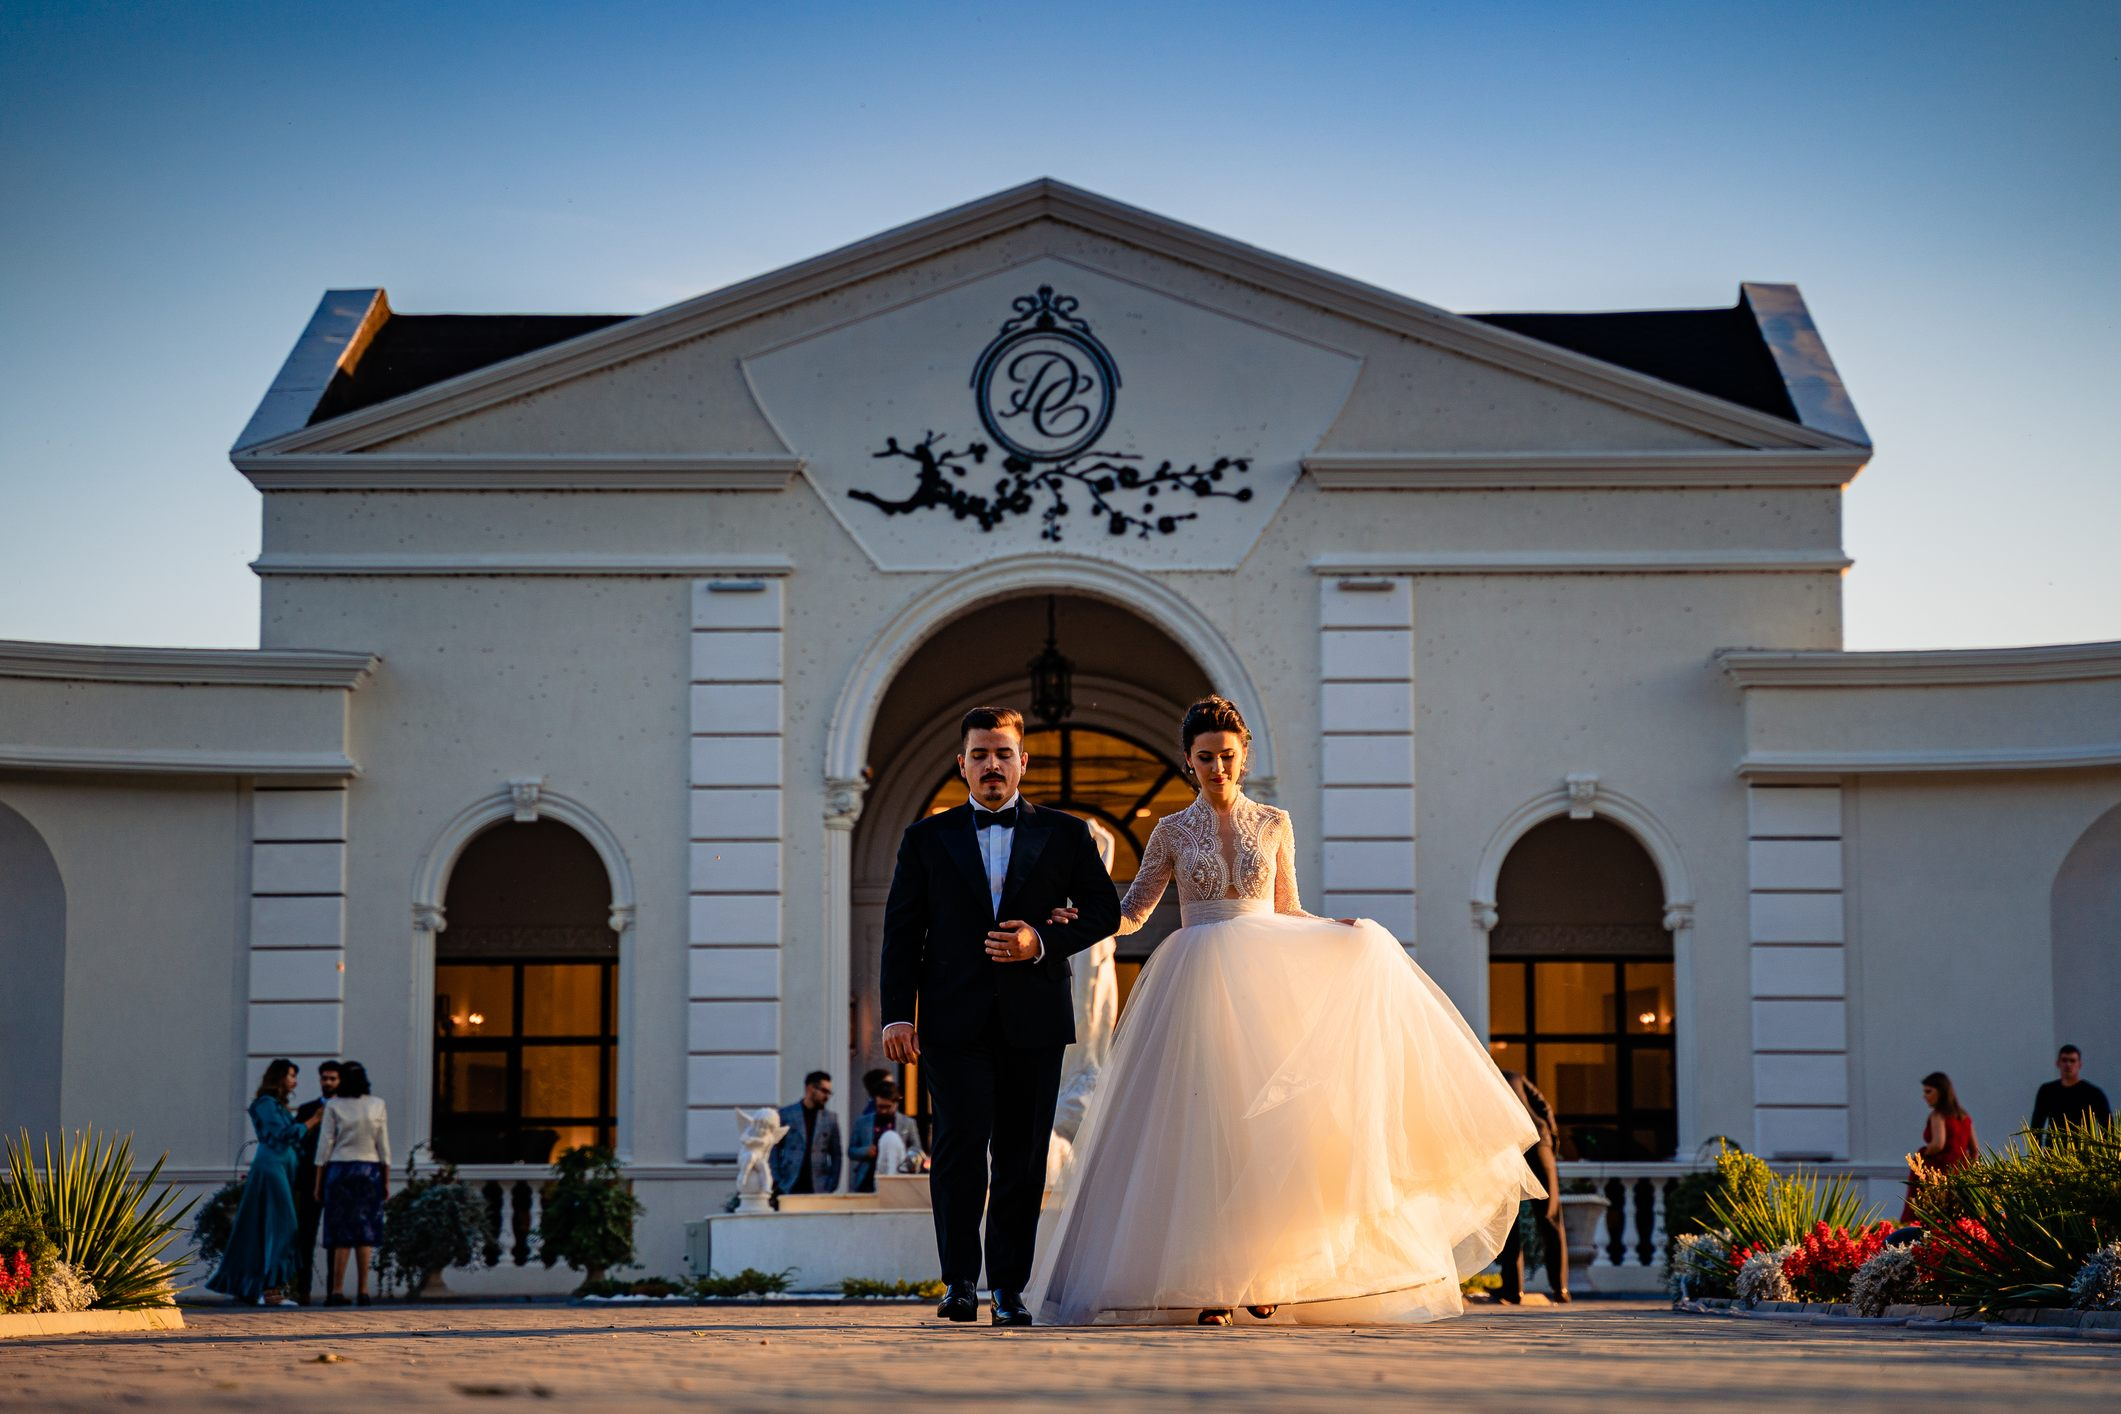 fotograf nunta bucuresti laurentiu nica  19 - Lorena & Matei | Fotografii nunta Bucuresti | Restaurant Domeniul cu Ciresi